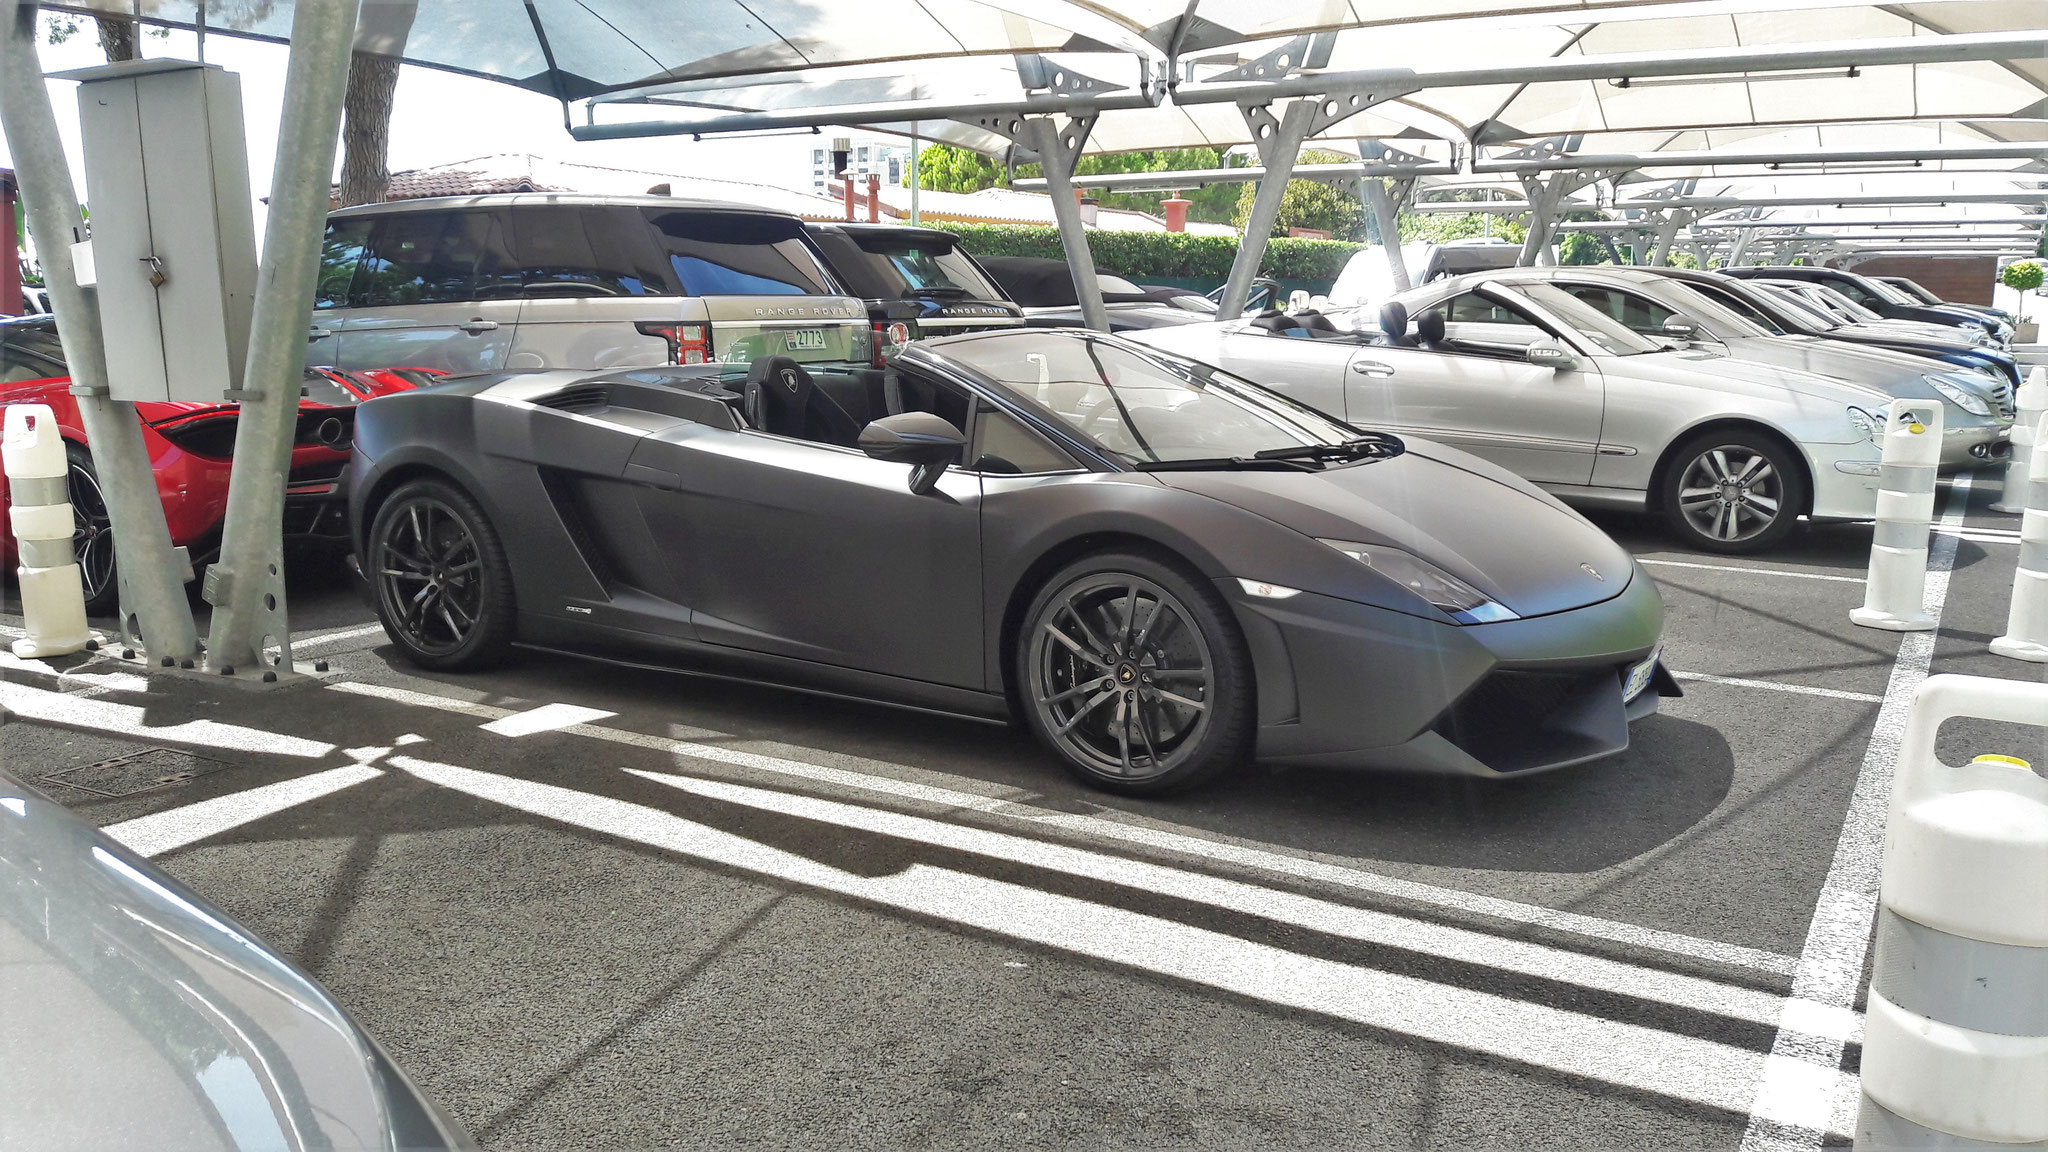 Lamborghini Gallardo LP 550 Spyder - EL-888-AD (ITA)